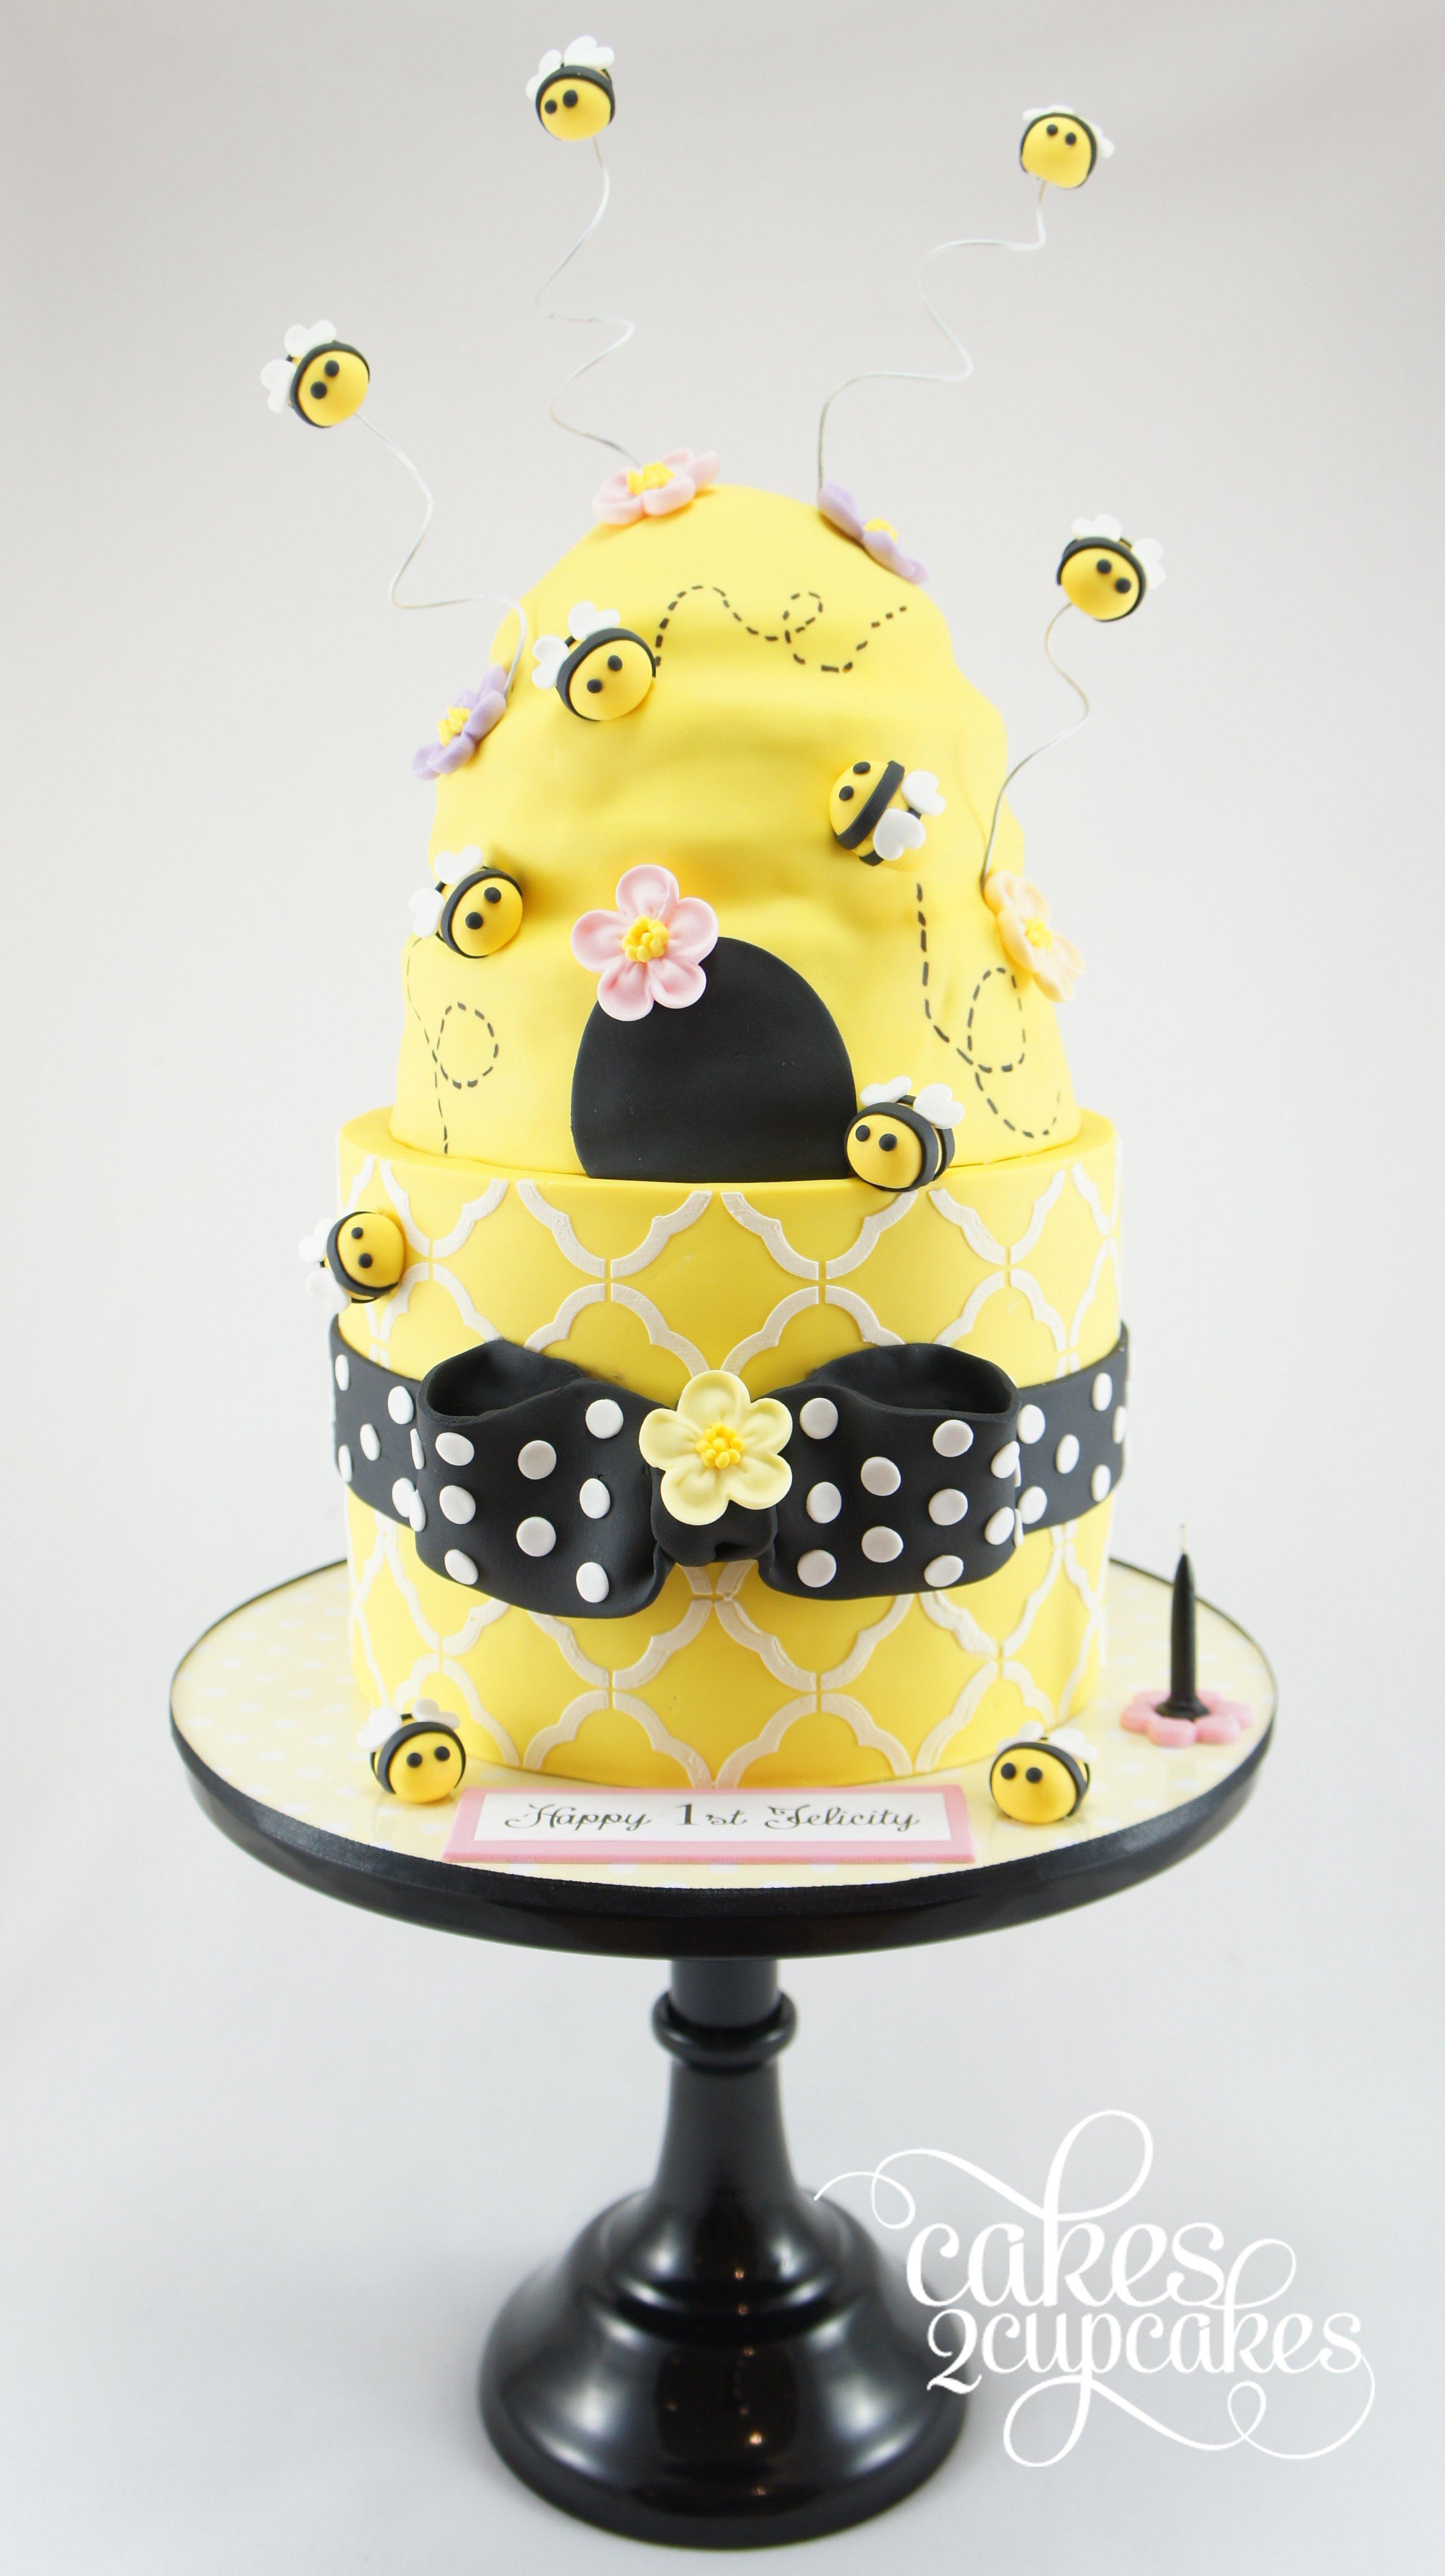 cakes2cupcakes-beehive cake.jpg